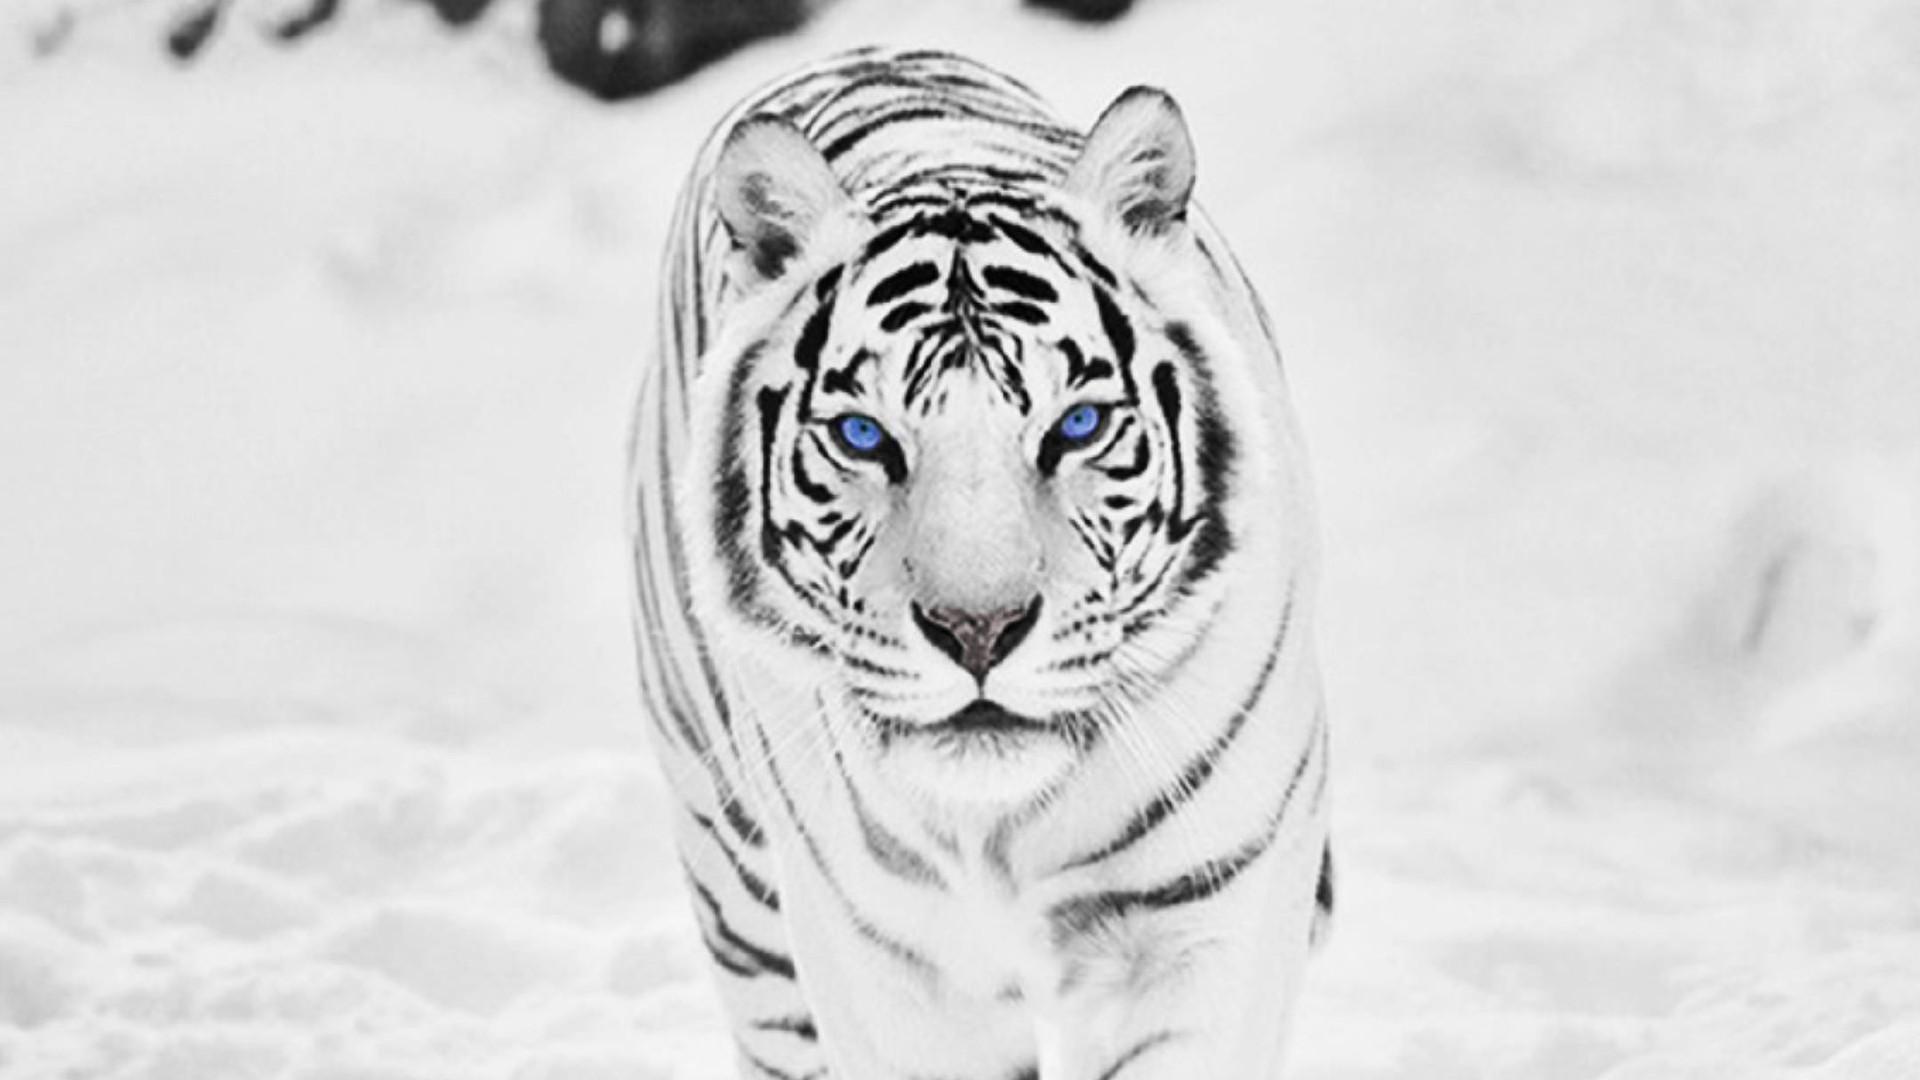 White Tiger Wallpapers   Top 849 White Tiger Wallpapers